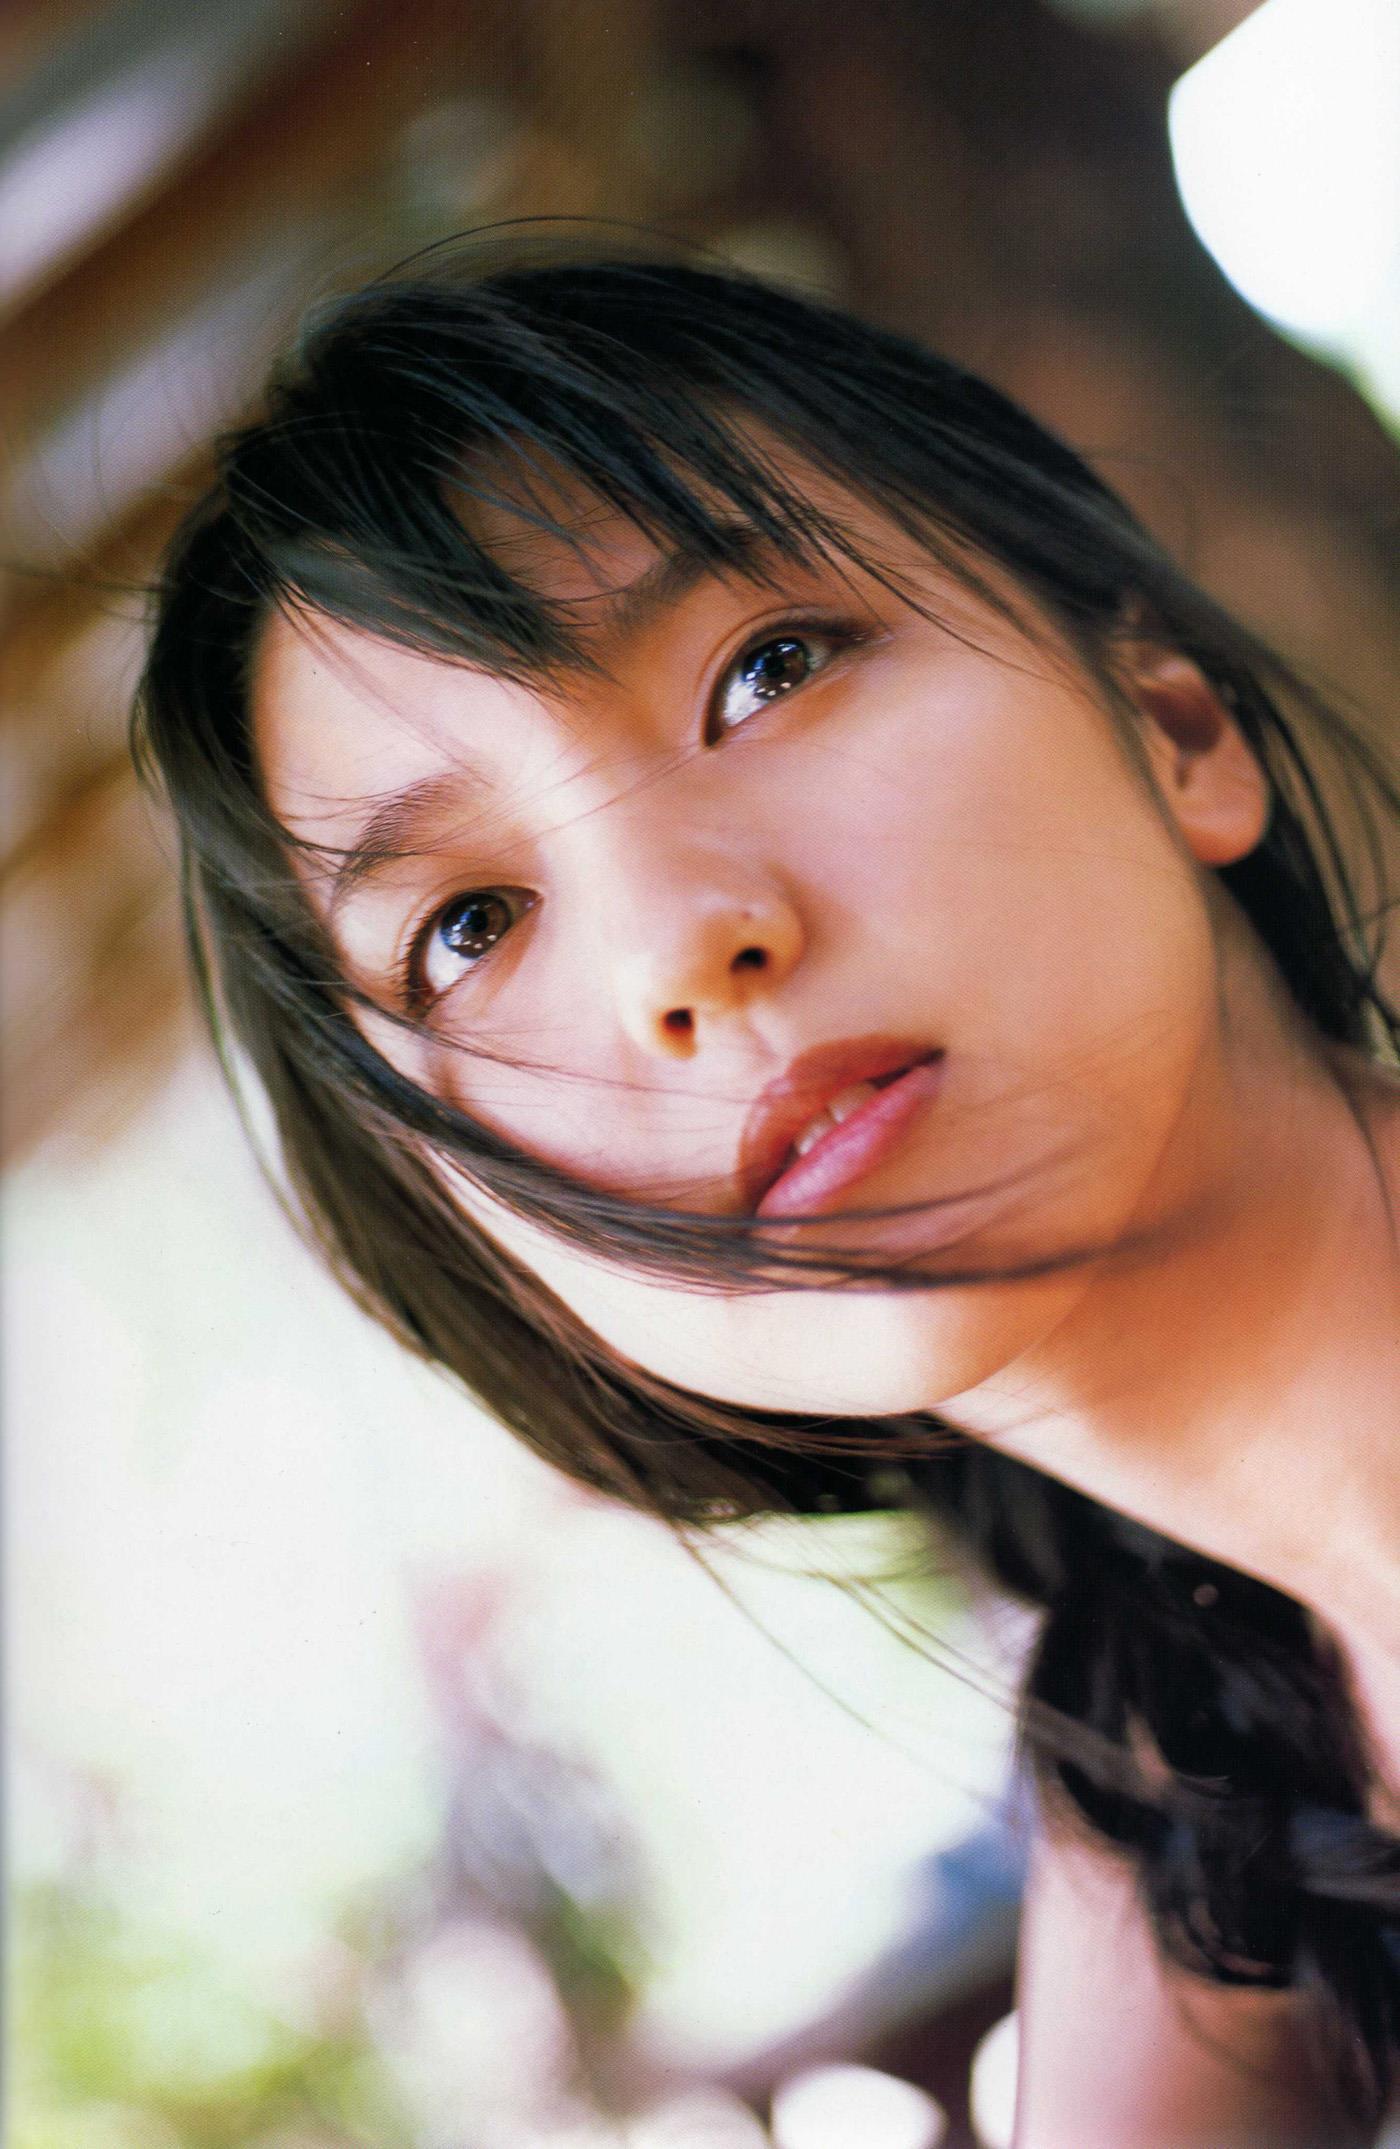 真野恵里菜 エロ画像 82